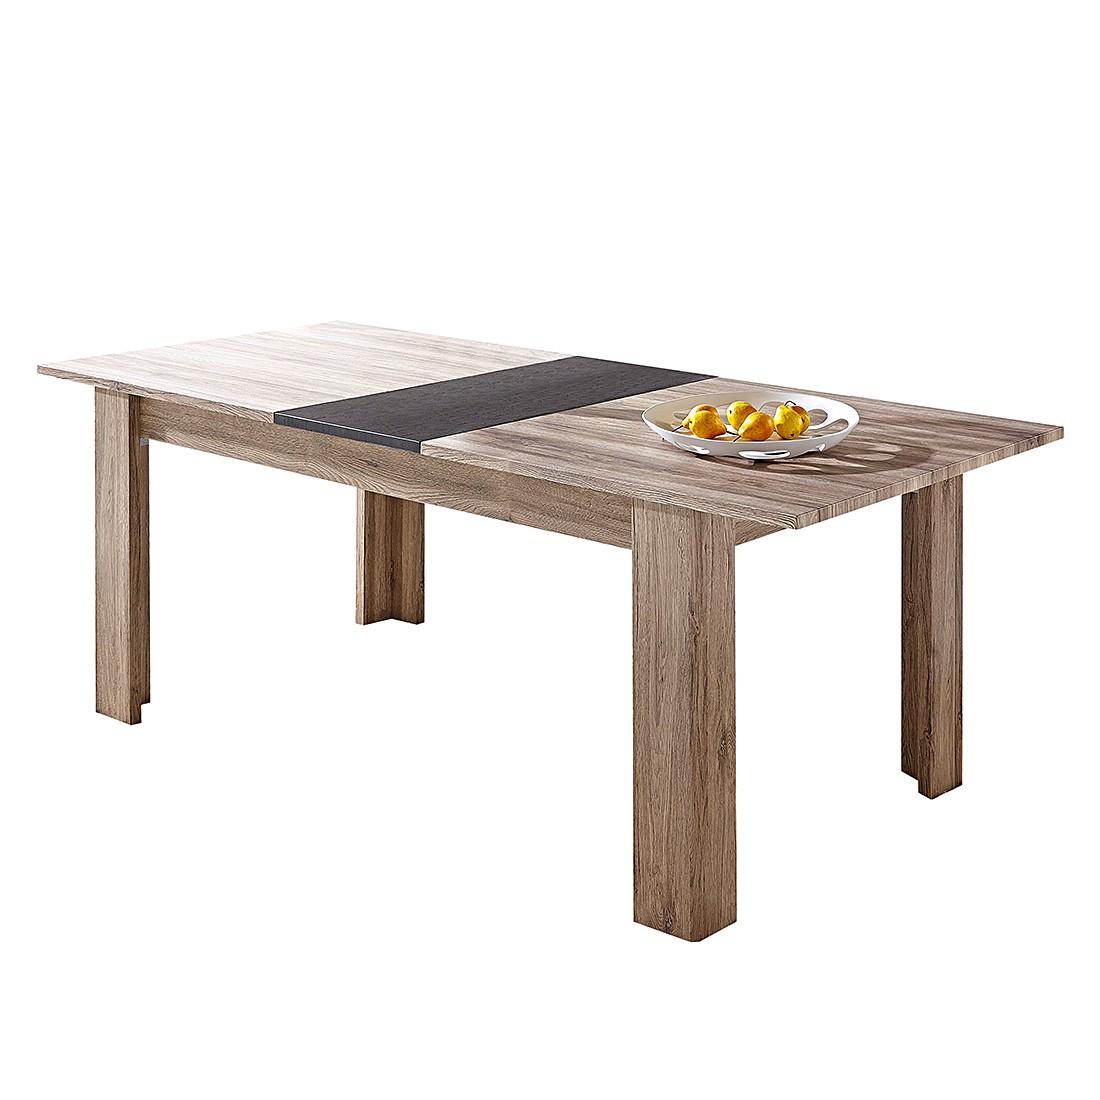 Table à manger Theta (extractible) - Imitation chêne de San Remo foncé, Naturoo